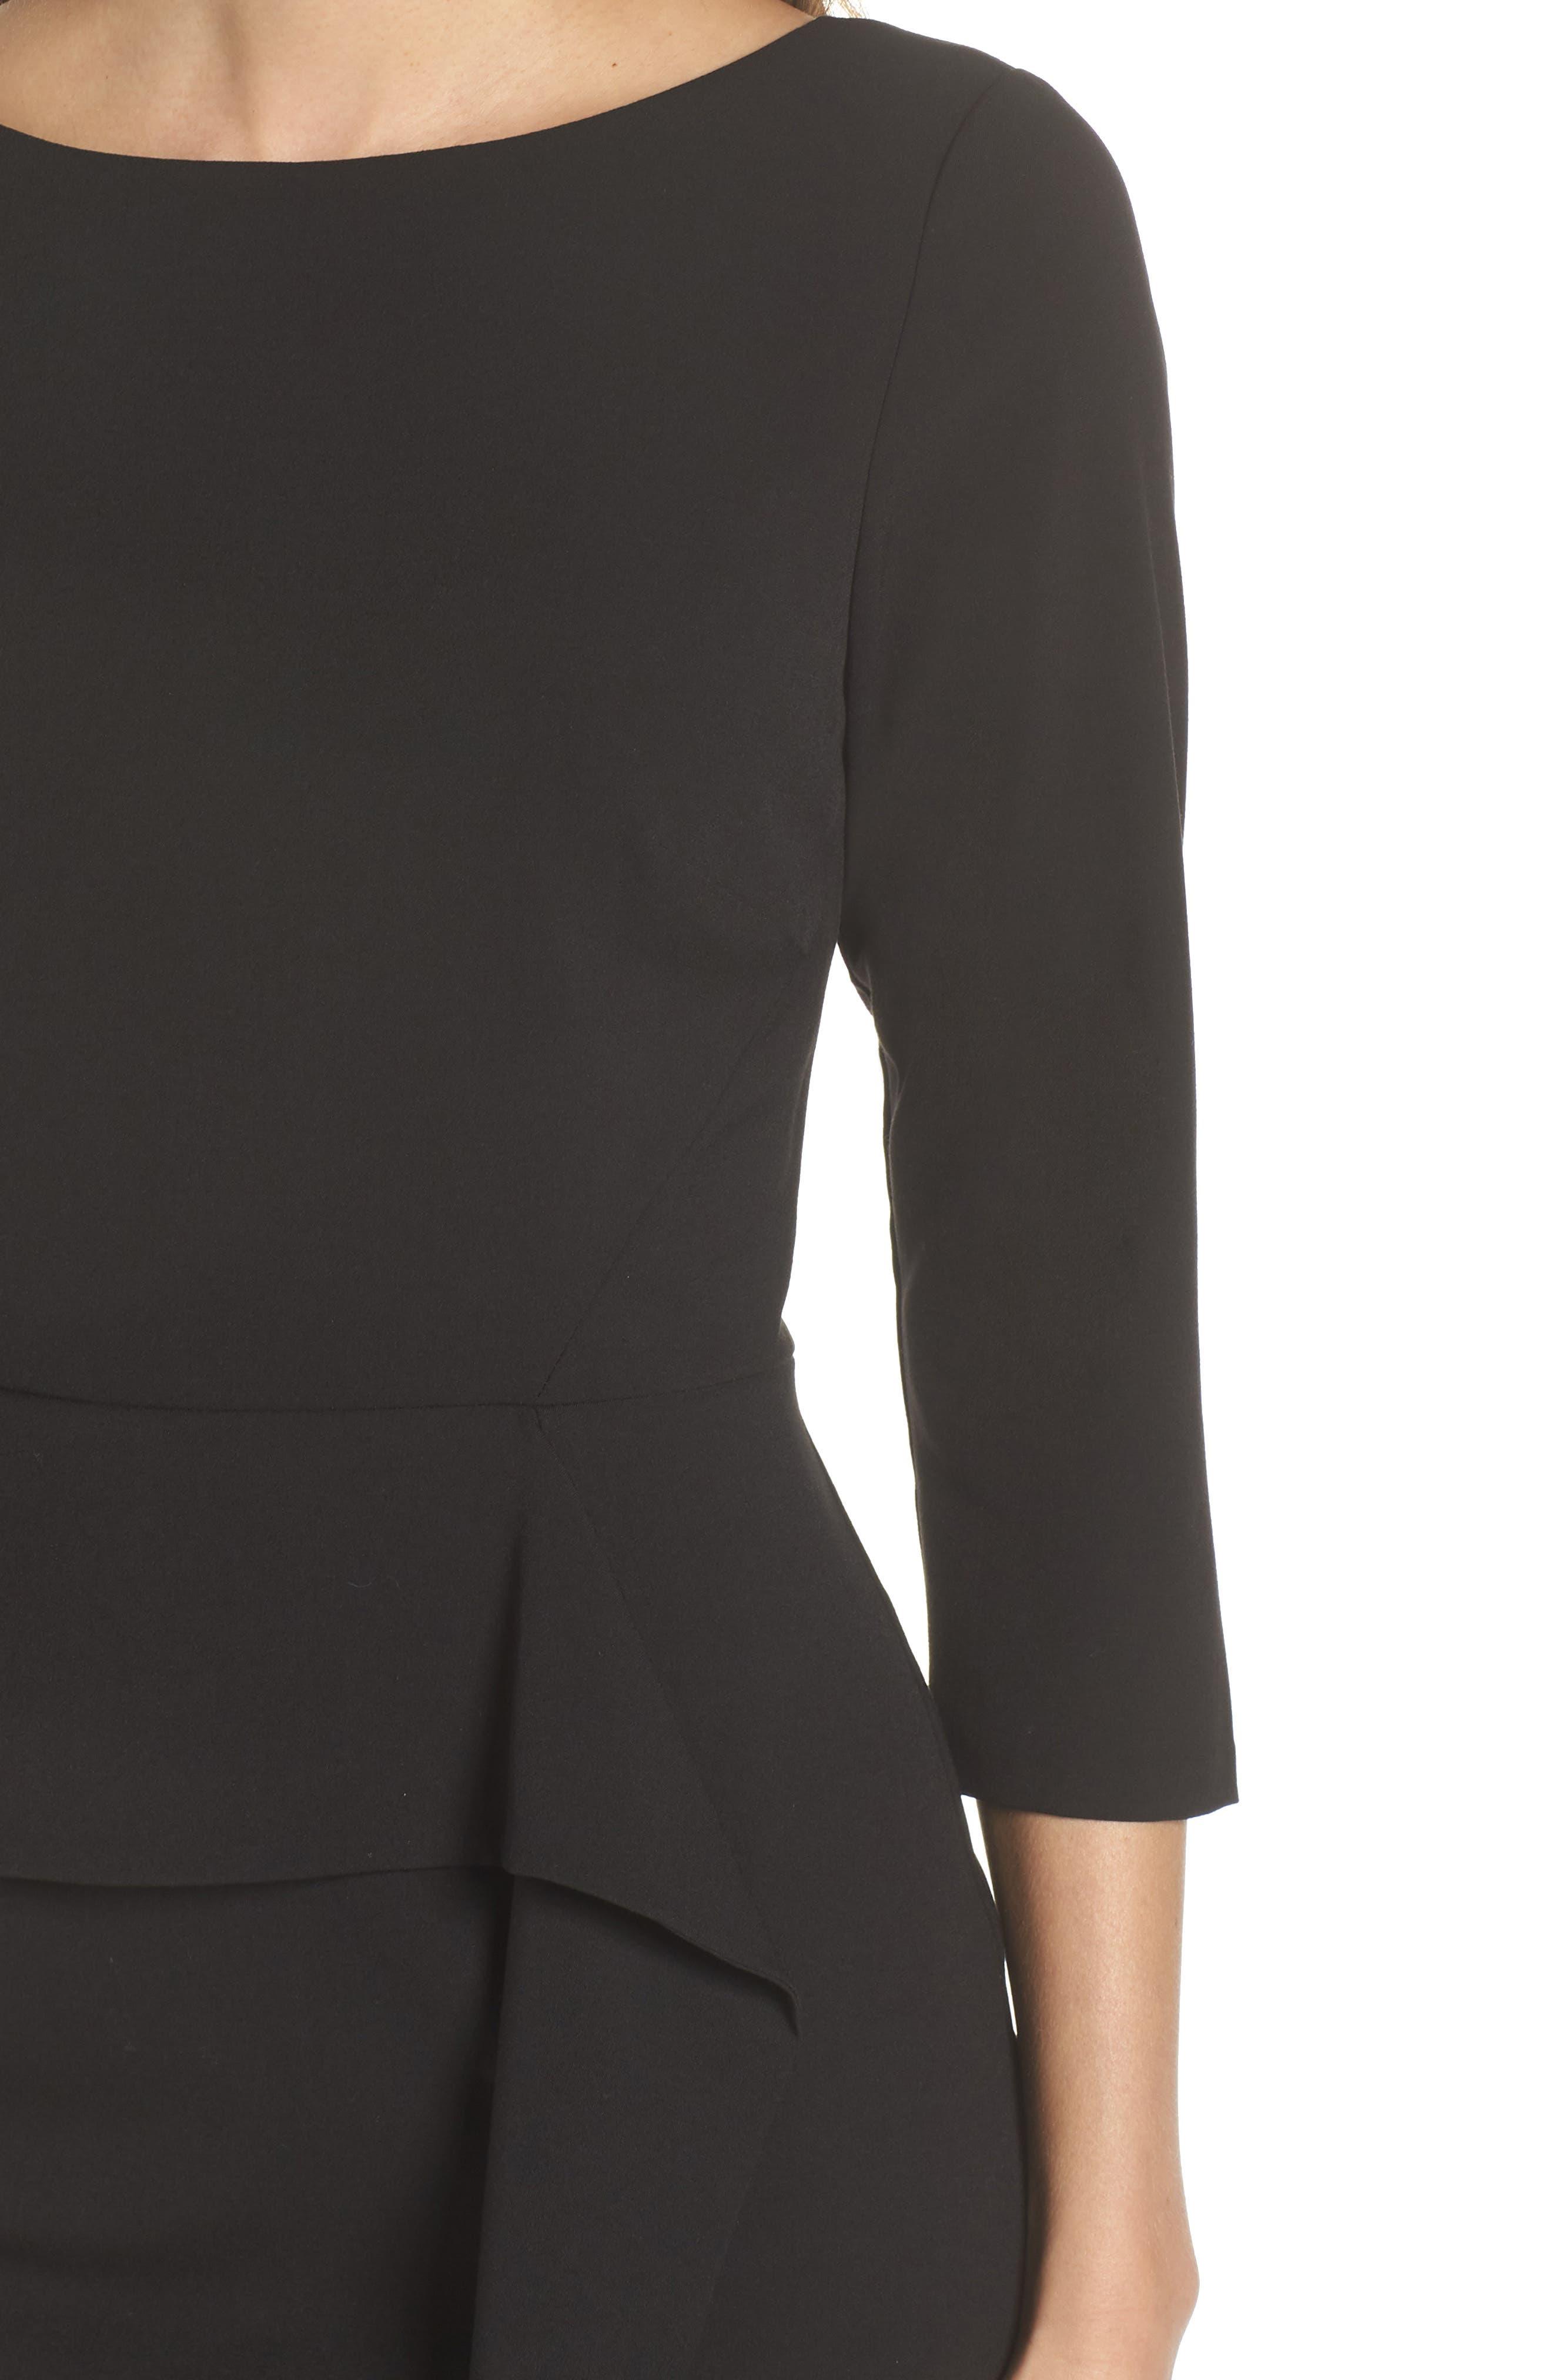 VINCE CAMUTO,                             Angled Ruffle Sheath Dress,                             Alternate thumbnail 5, color,                             BLACK